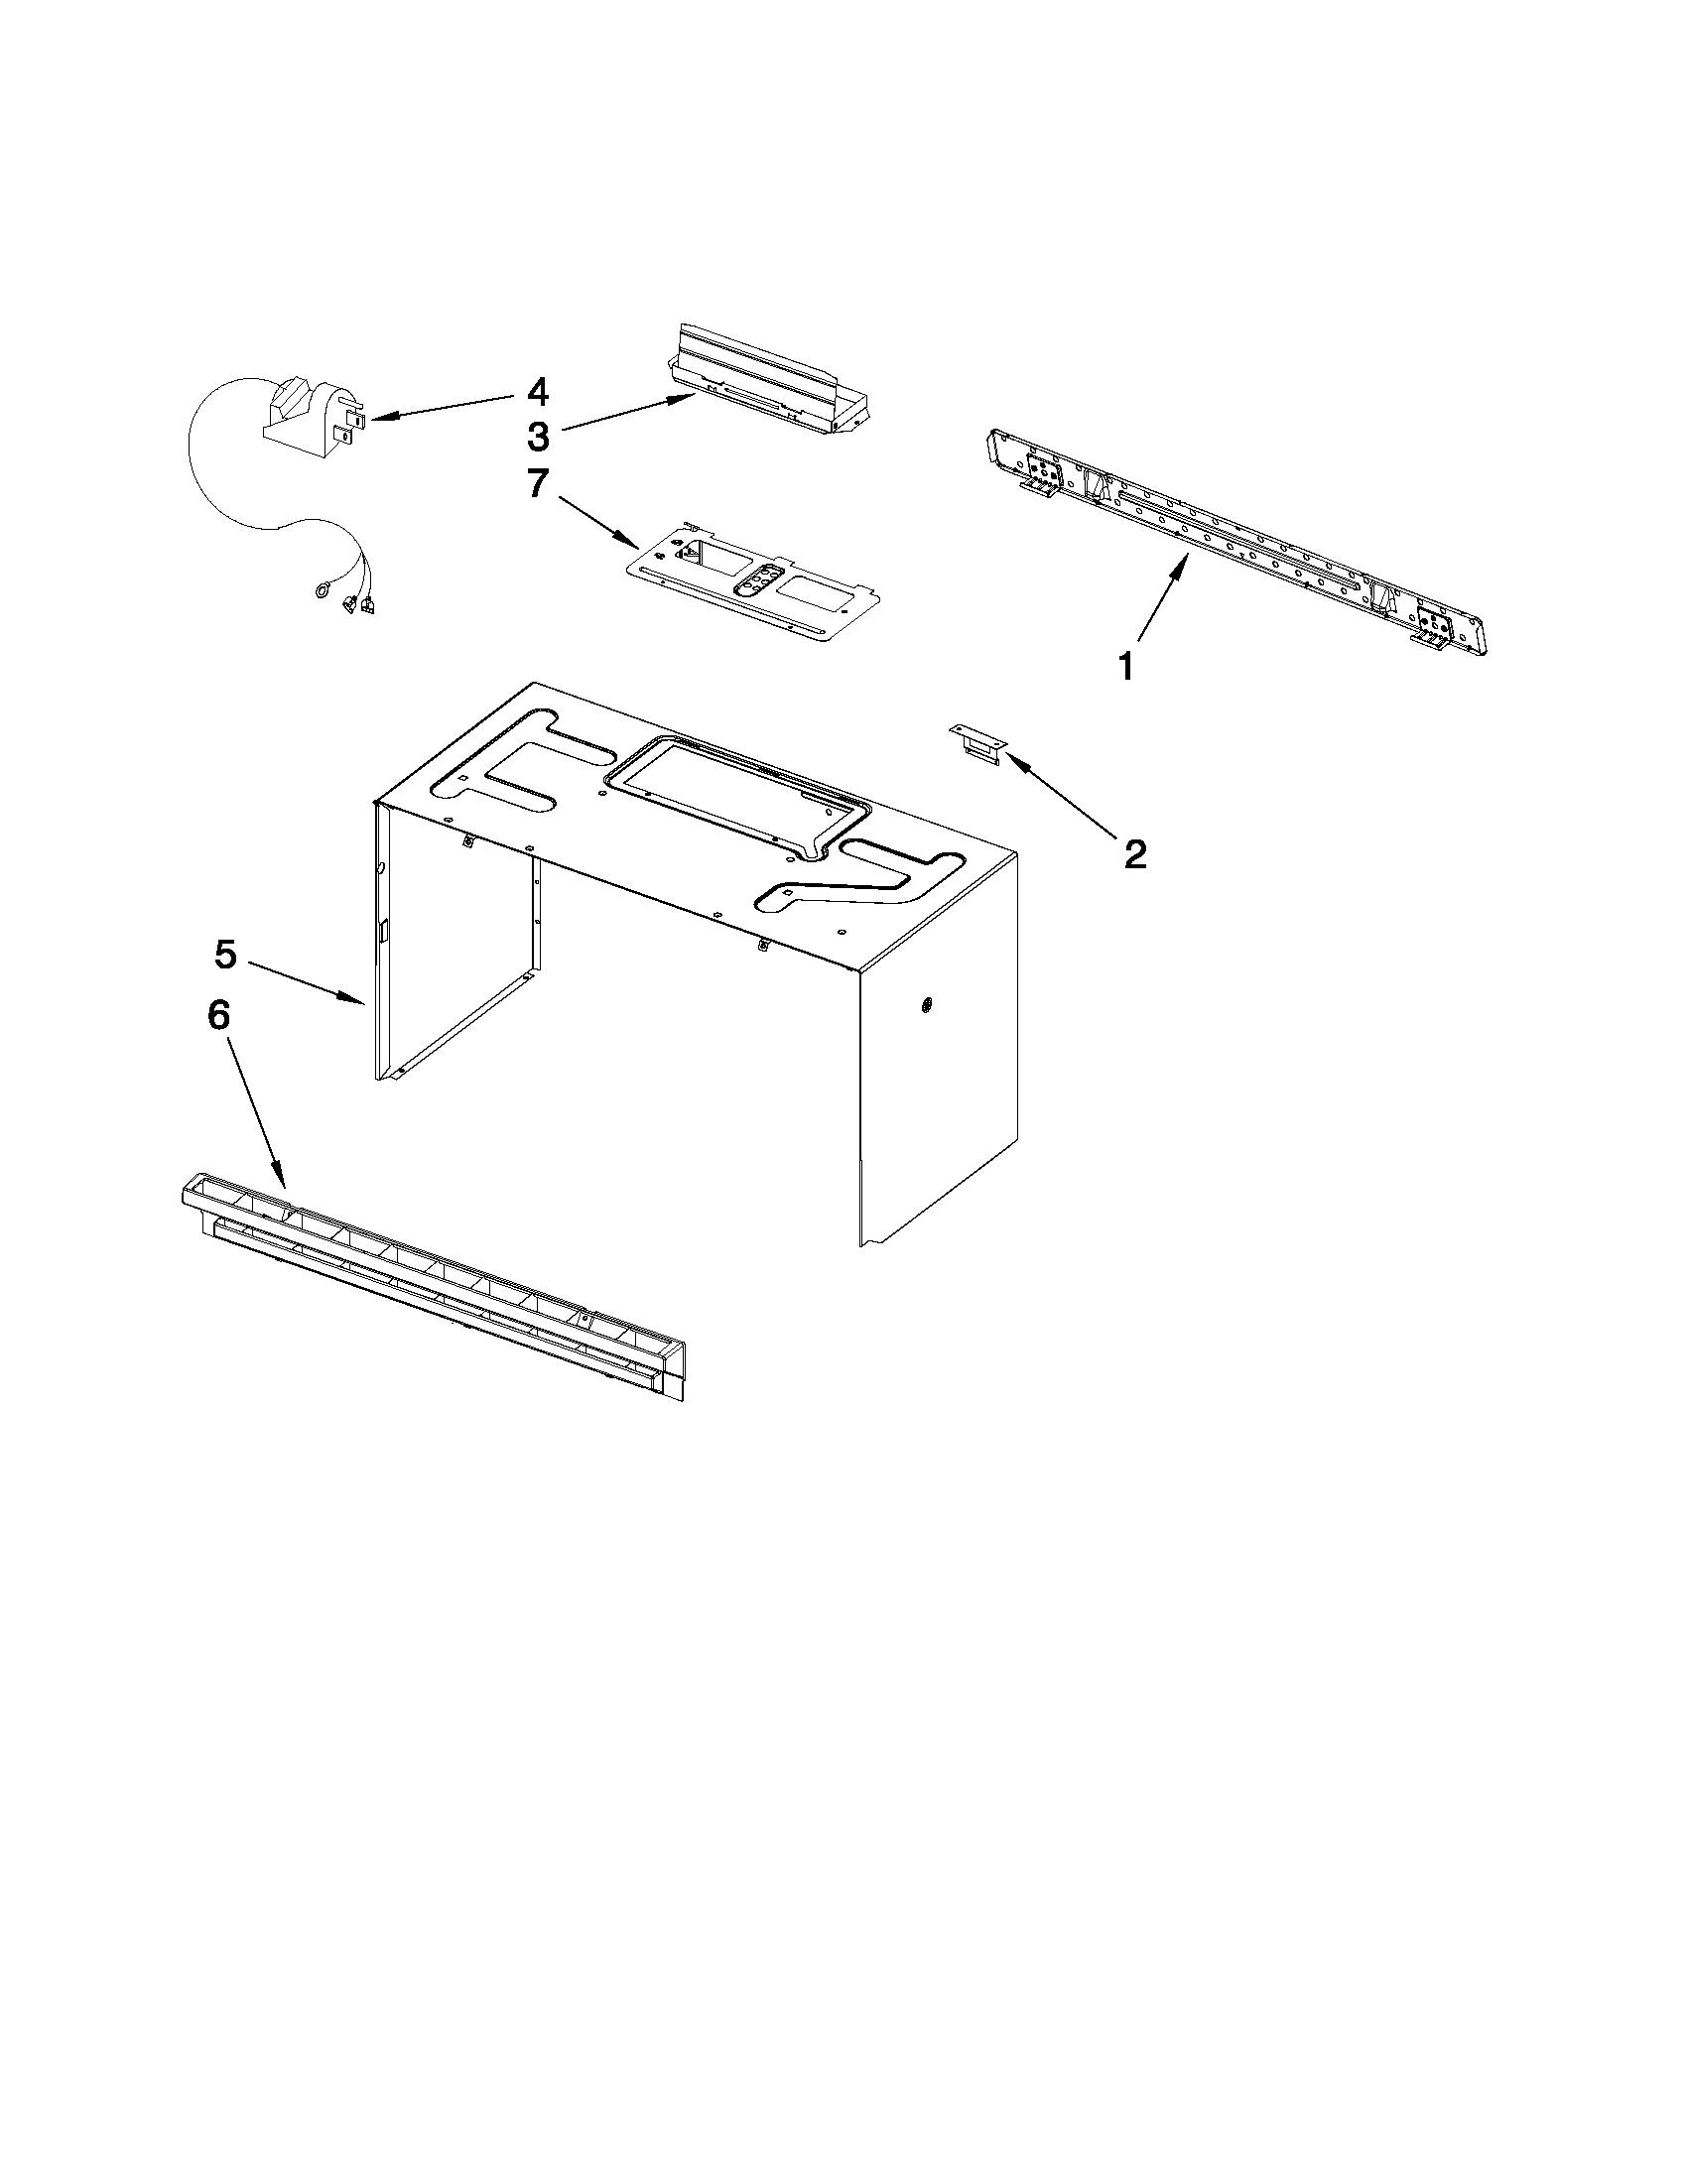 ikea datid exhaust hood installation instructions